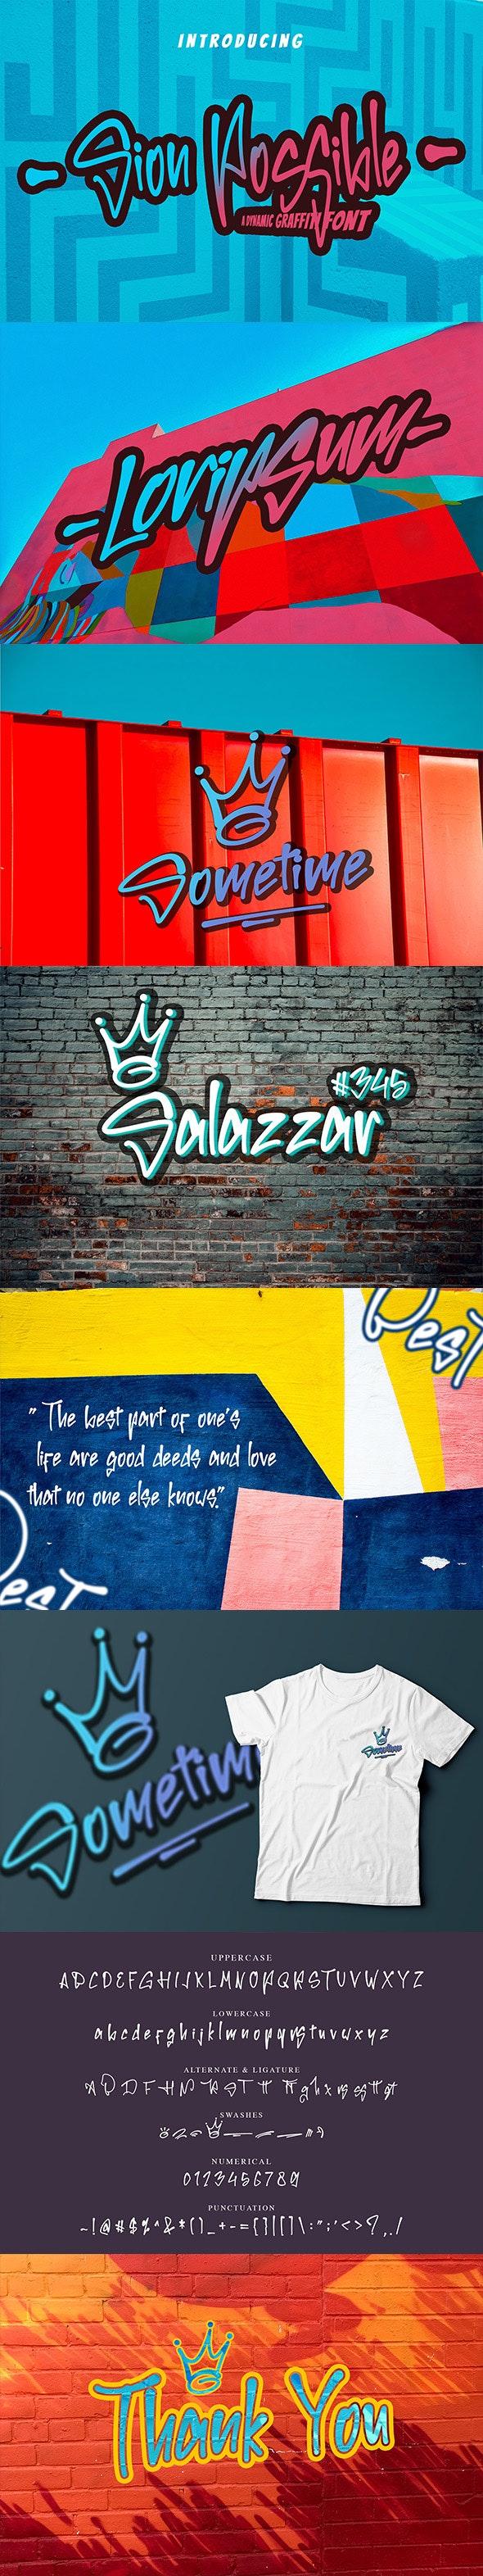 Sion Possible Graffiti Font - Graffiti Fonts